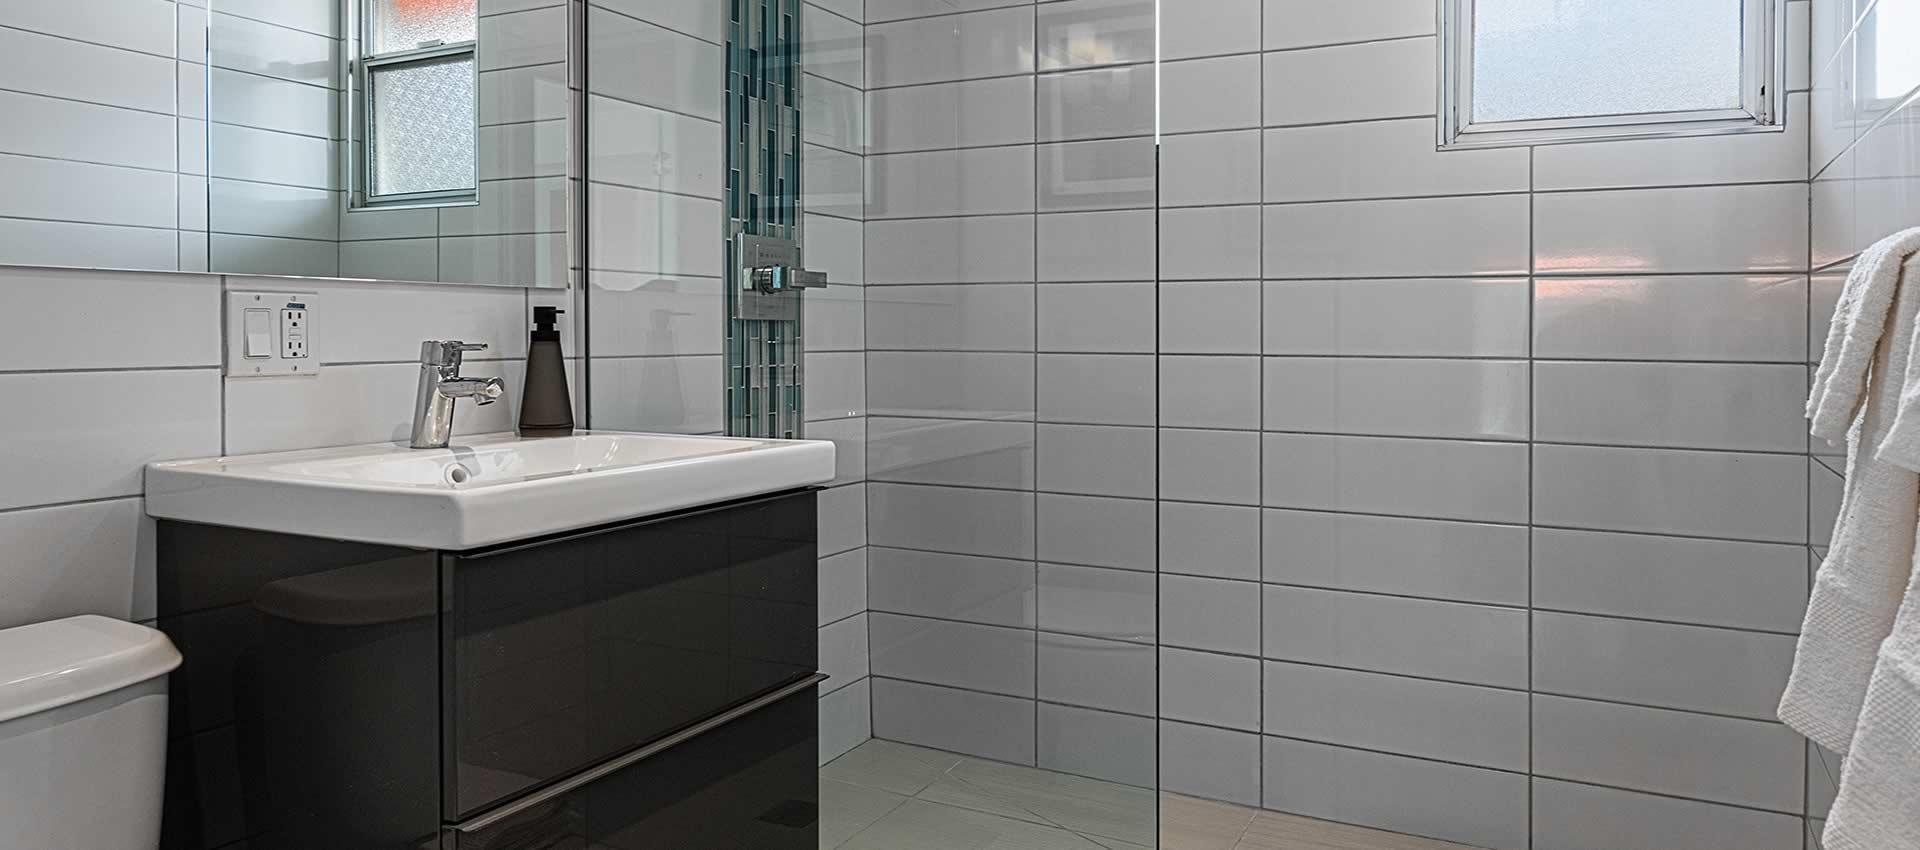 twist-hotel-room221-bath